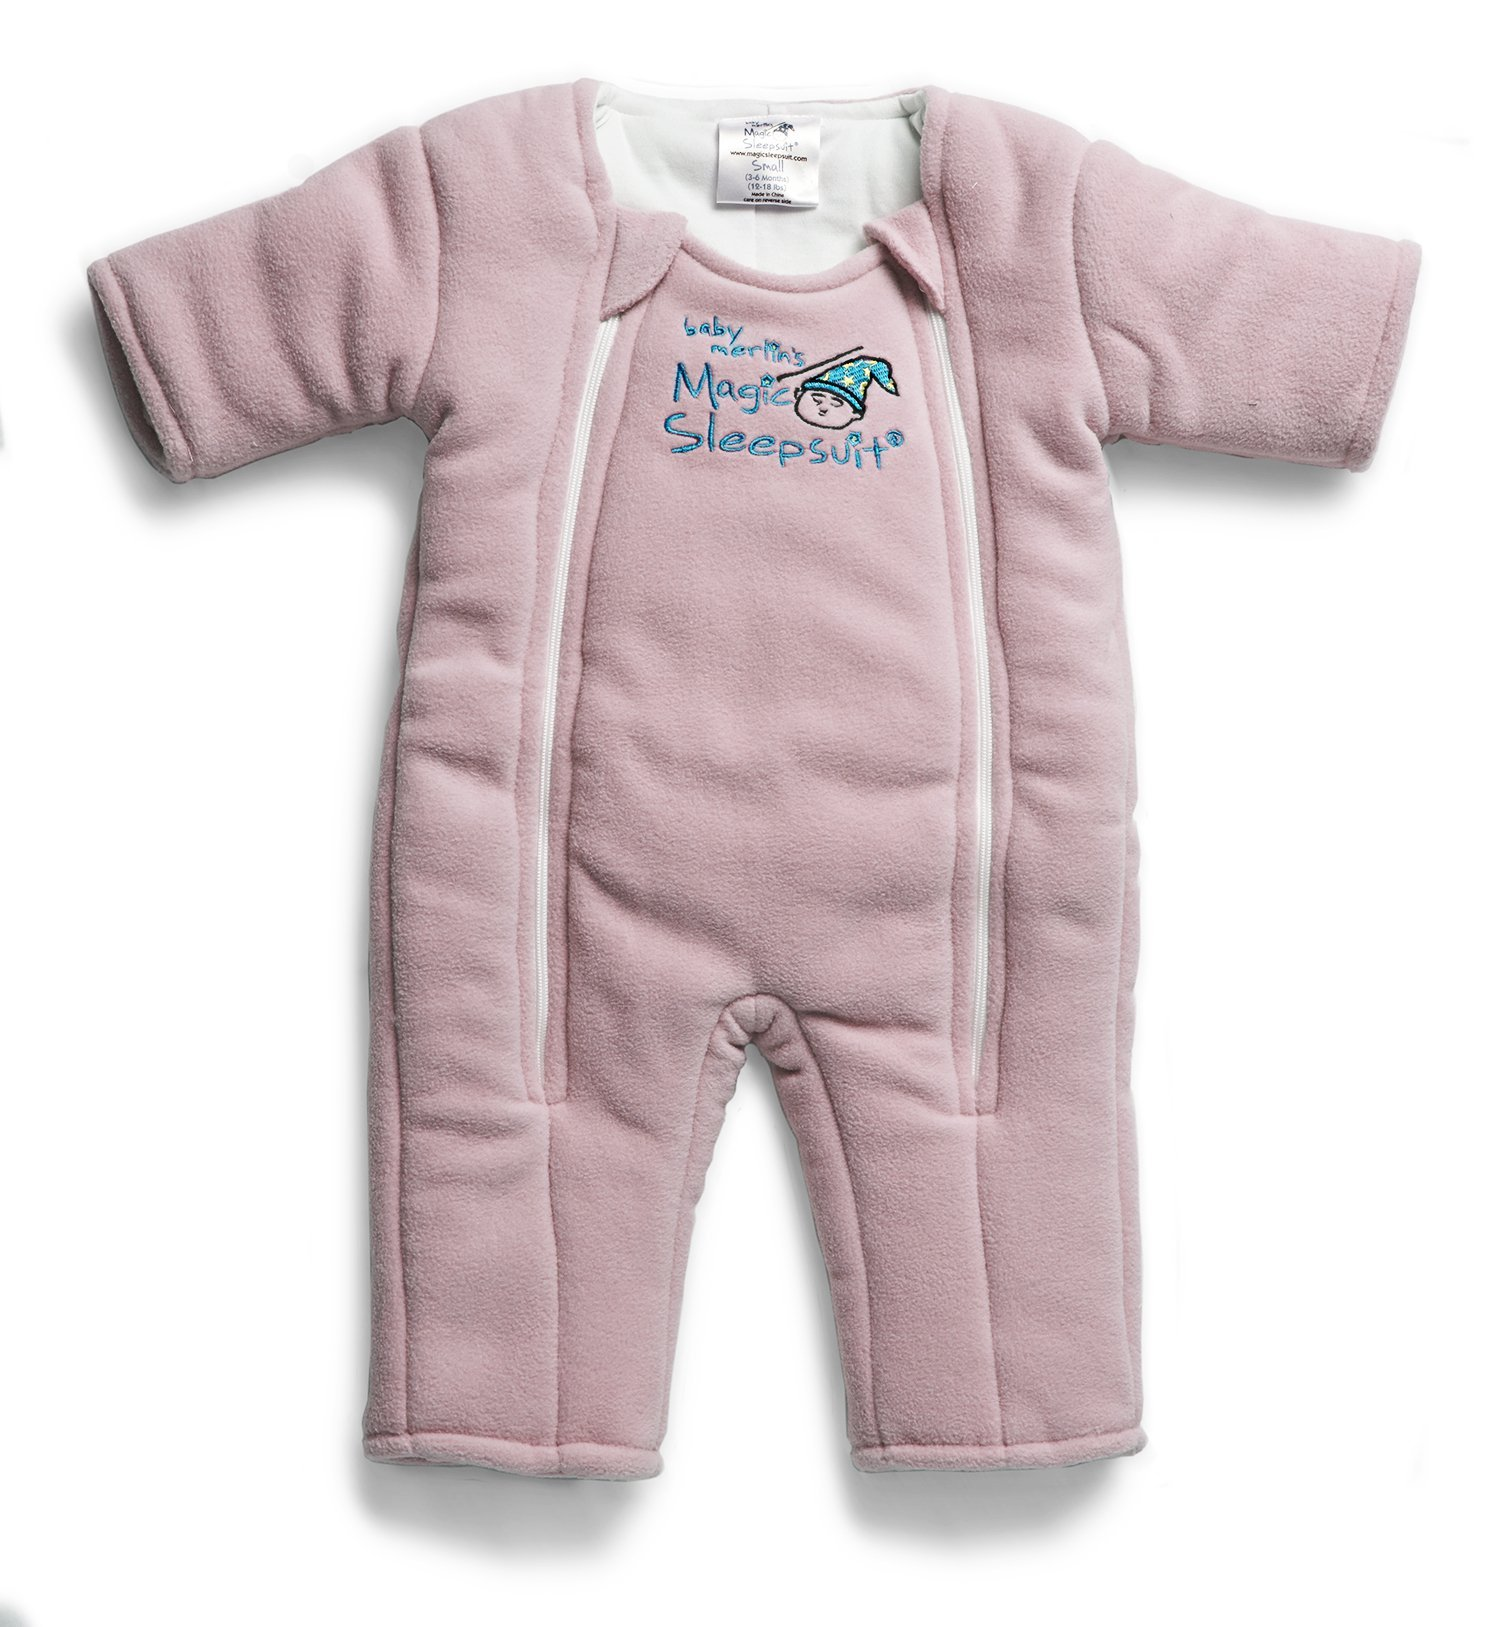 Baby Merlin's Magic Sleepsuit Microfleece - Pink - 3-6 months by Baby Merlin's Magic Sleepsuit